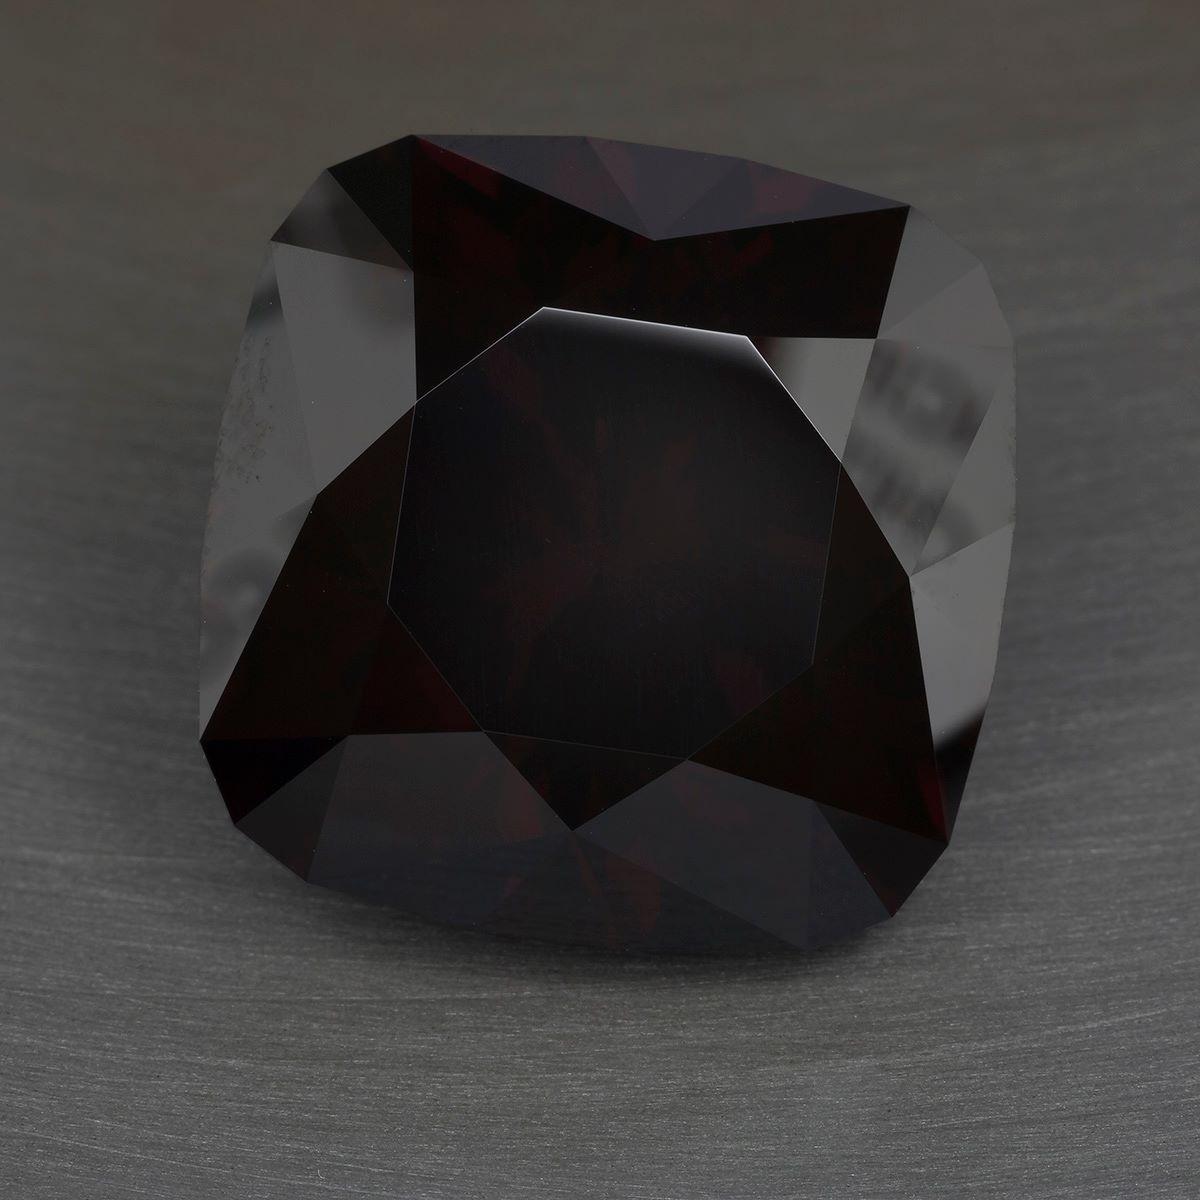 zircon buying - 51.87 carat Tanzanian zircon before treatment